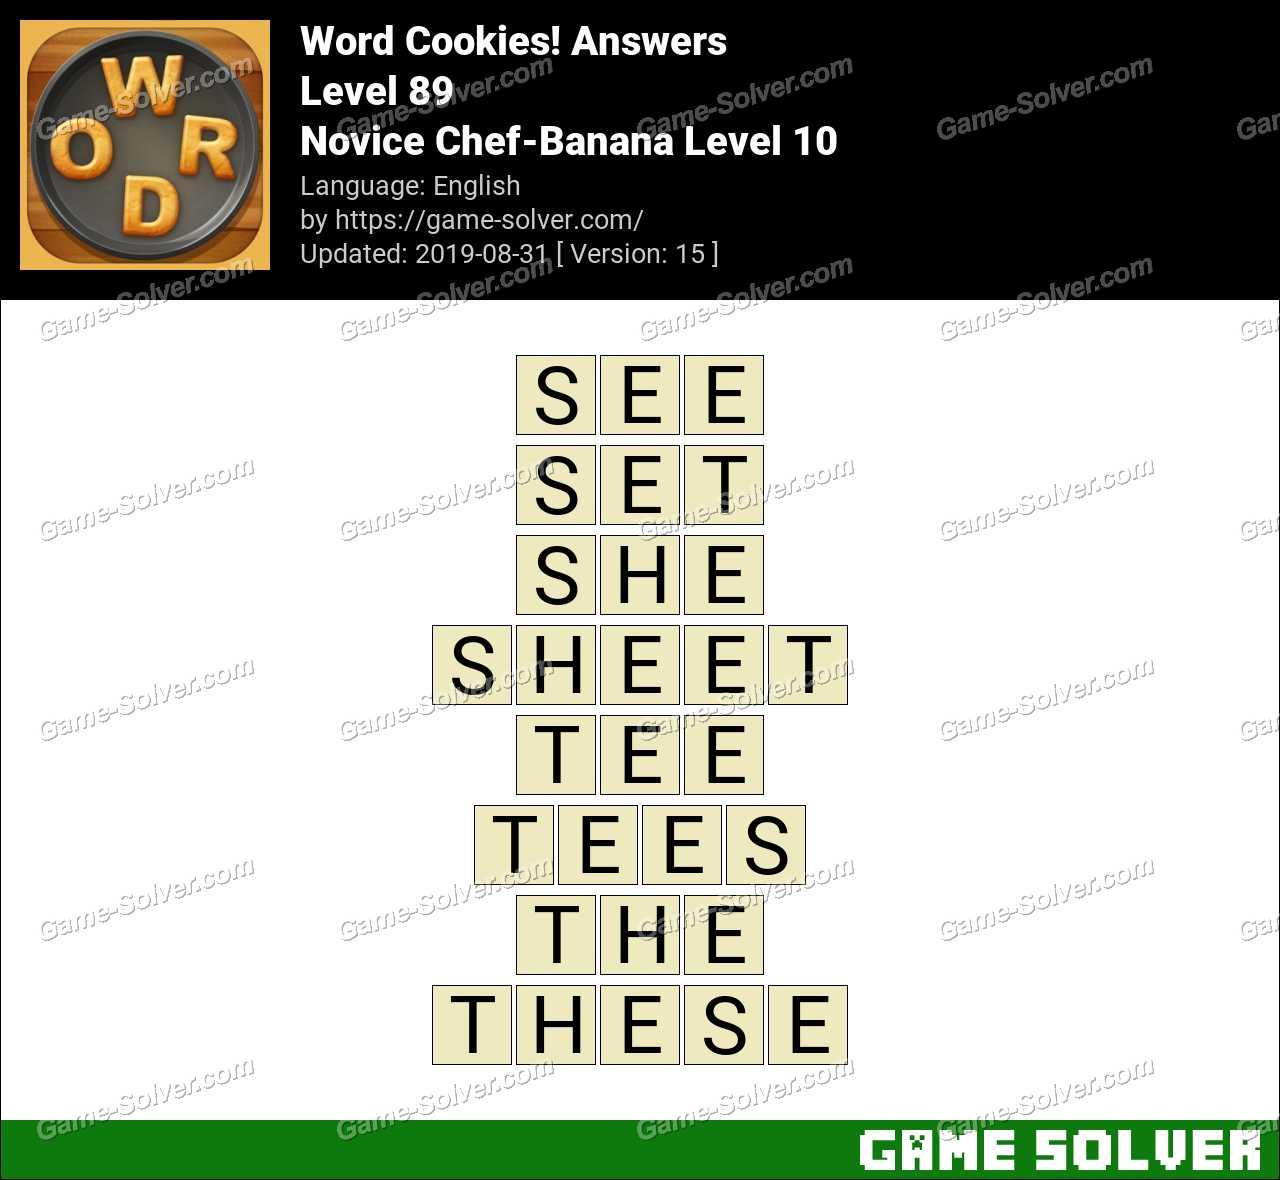 Word Cookies Novice Chef-Banana Level 10 Answers